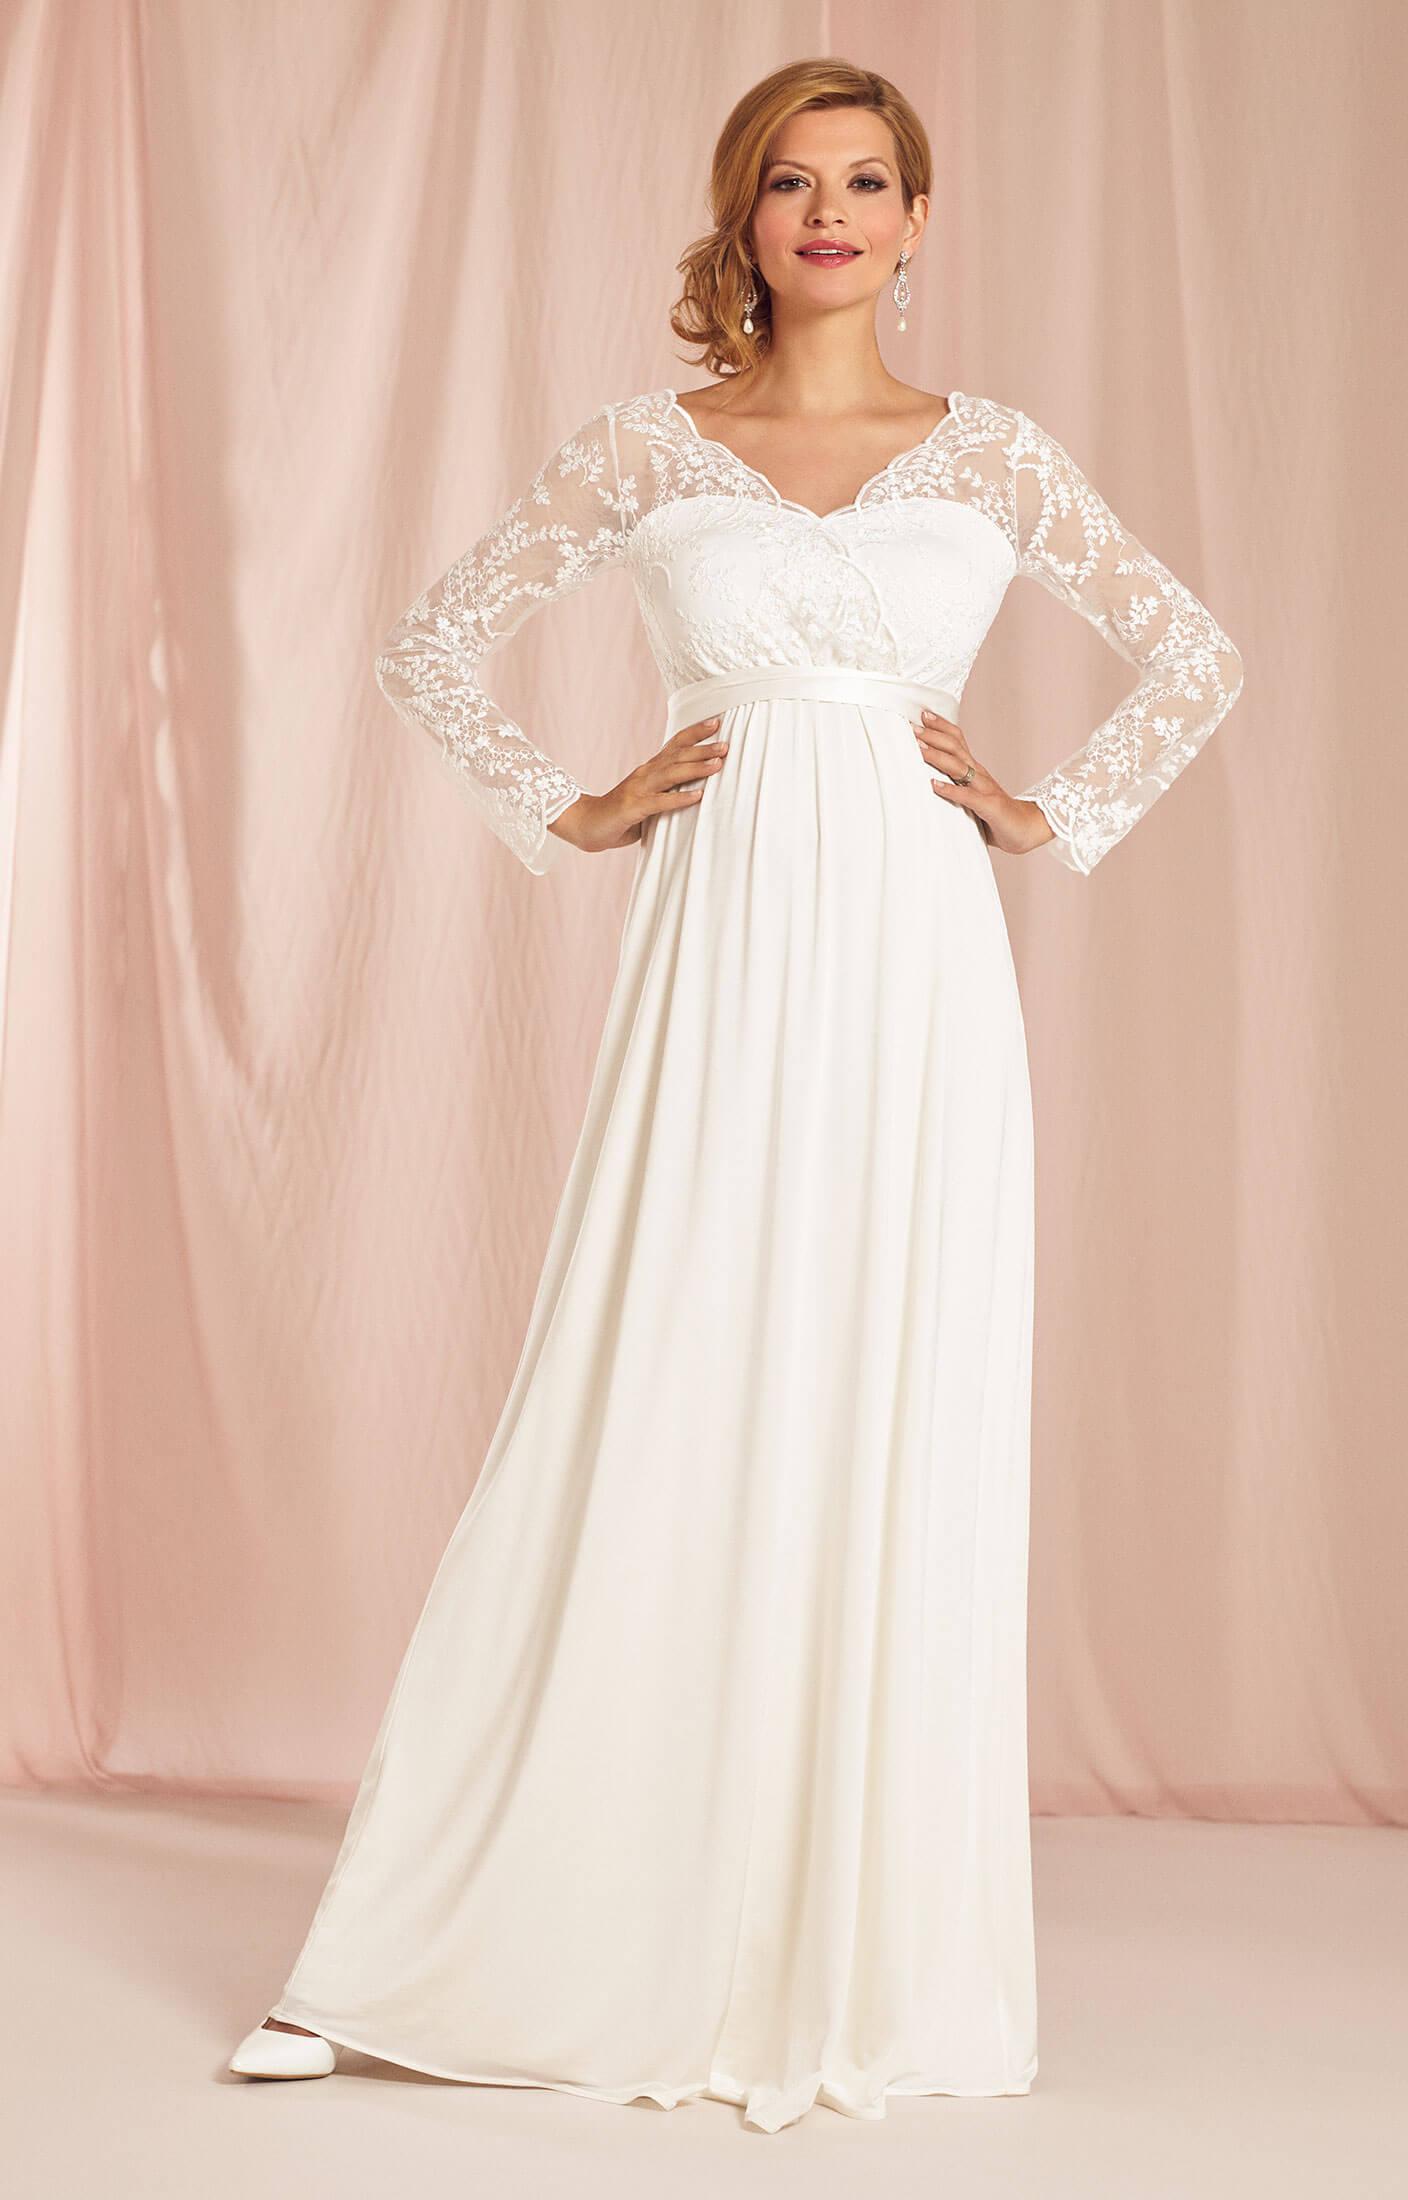 Rosalina maternity wedding gown ivory maternity wedding for Ivory maternity wedding dresses